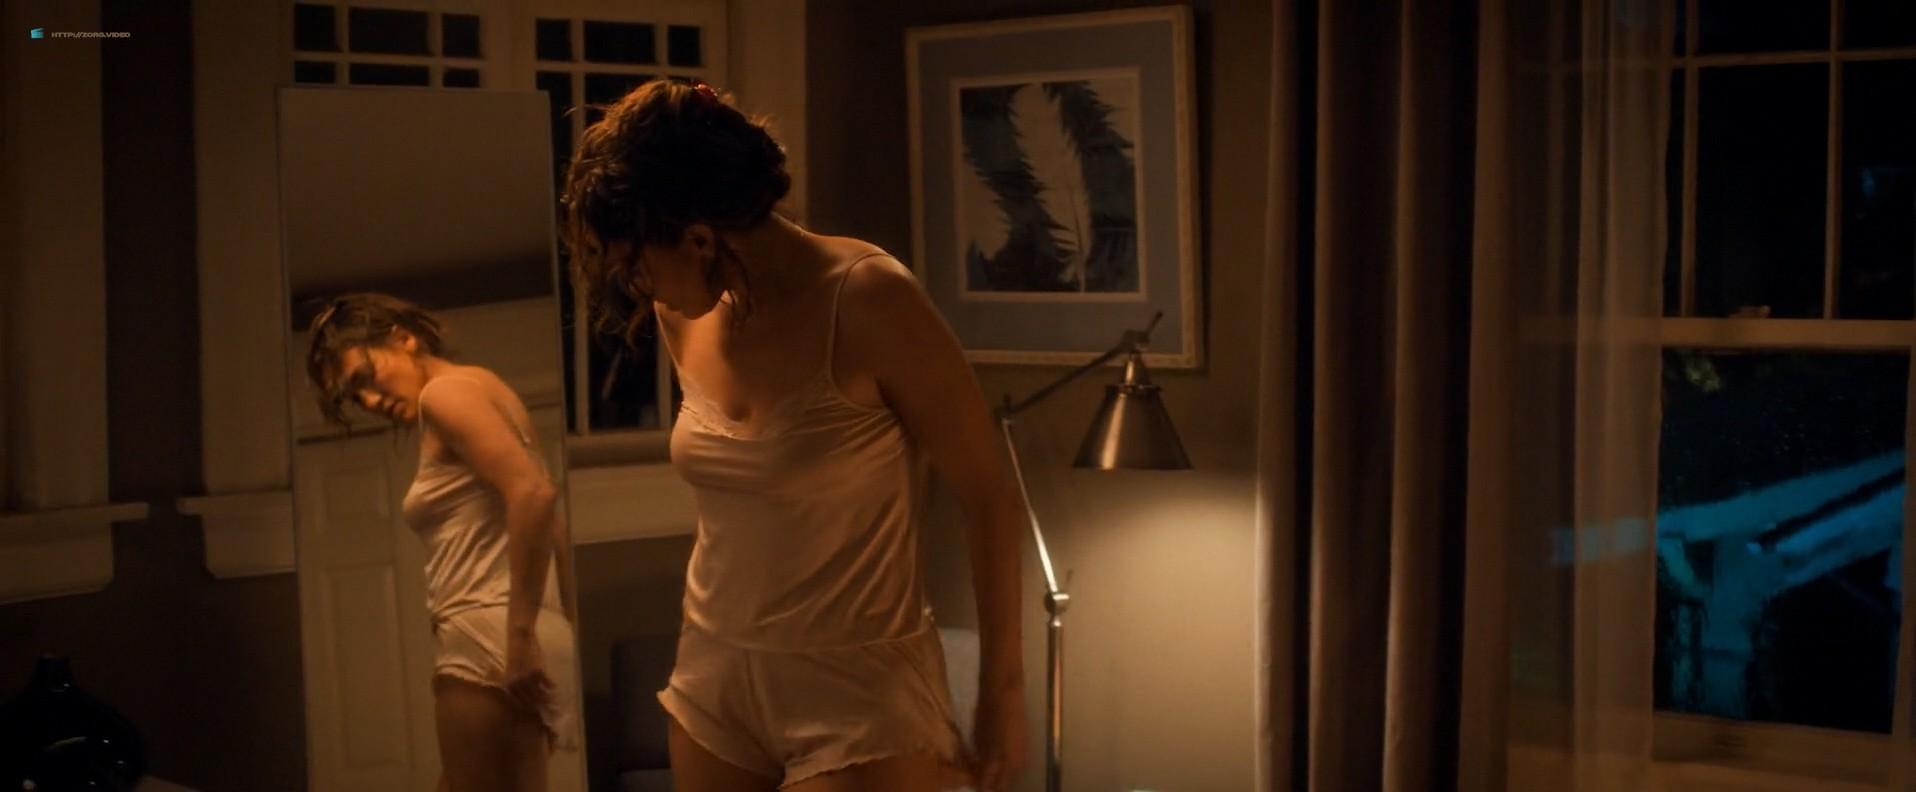 Jennifer Lopez hot sex scene and Lexi Atkins nude sex - The Boy Next Door (2015) HD 1080p (14)